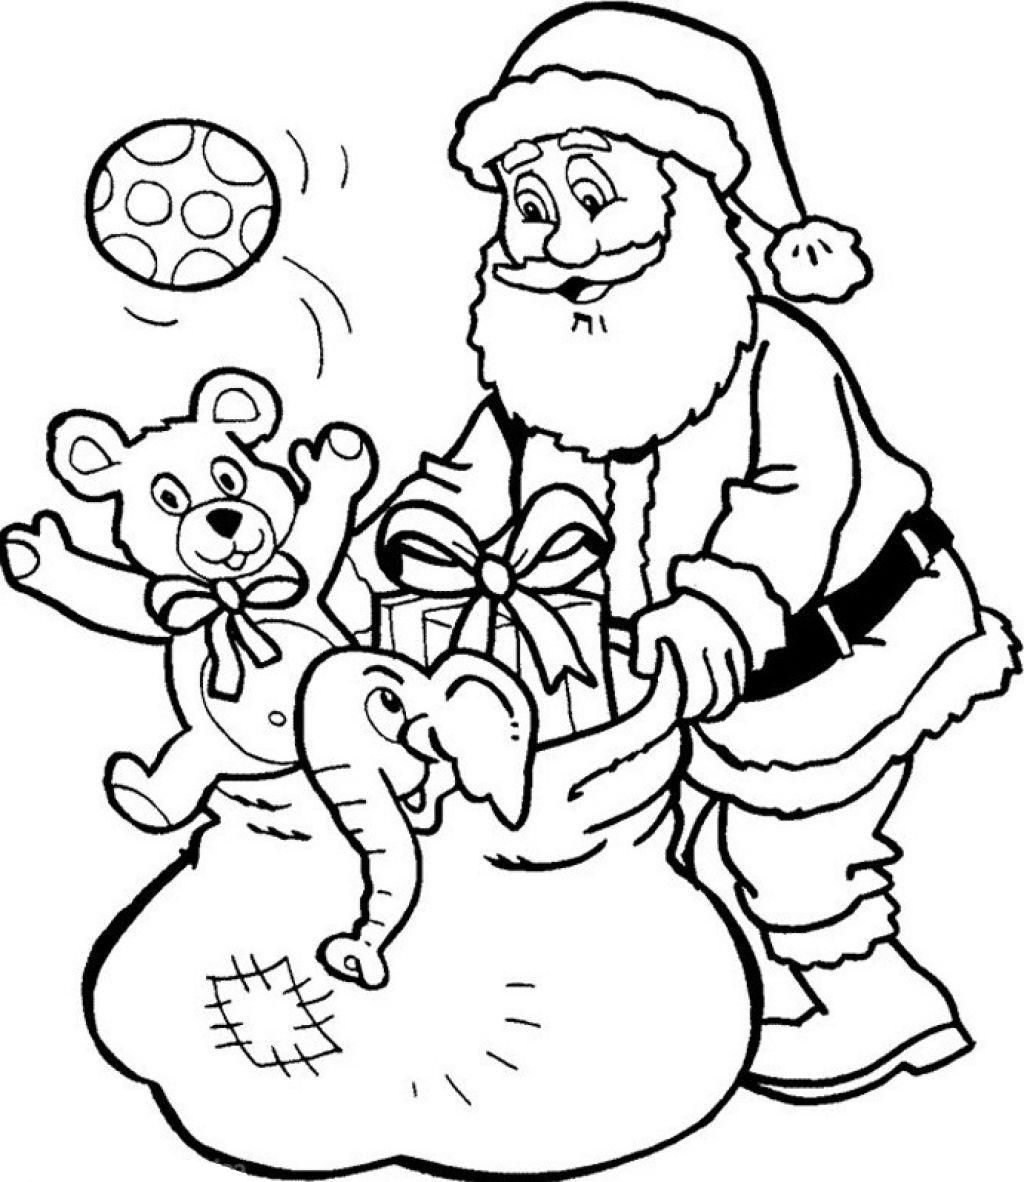 Santa Claus Coloring Pages Christmas Coloring Pages Santa